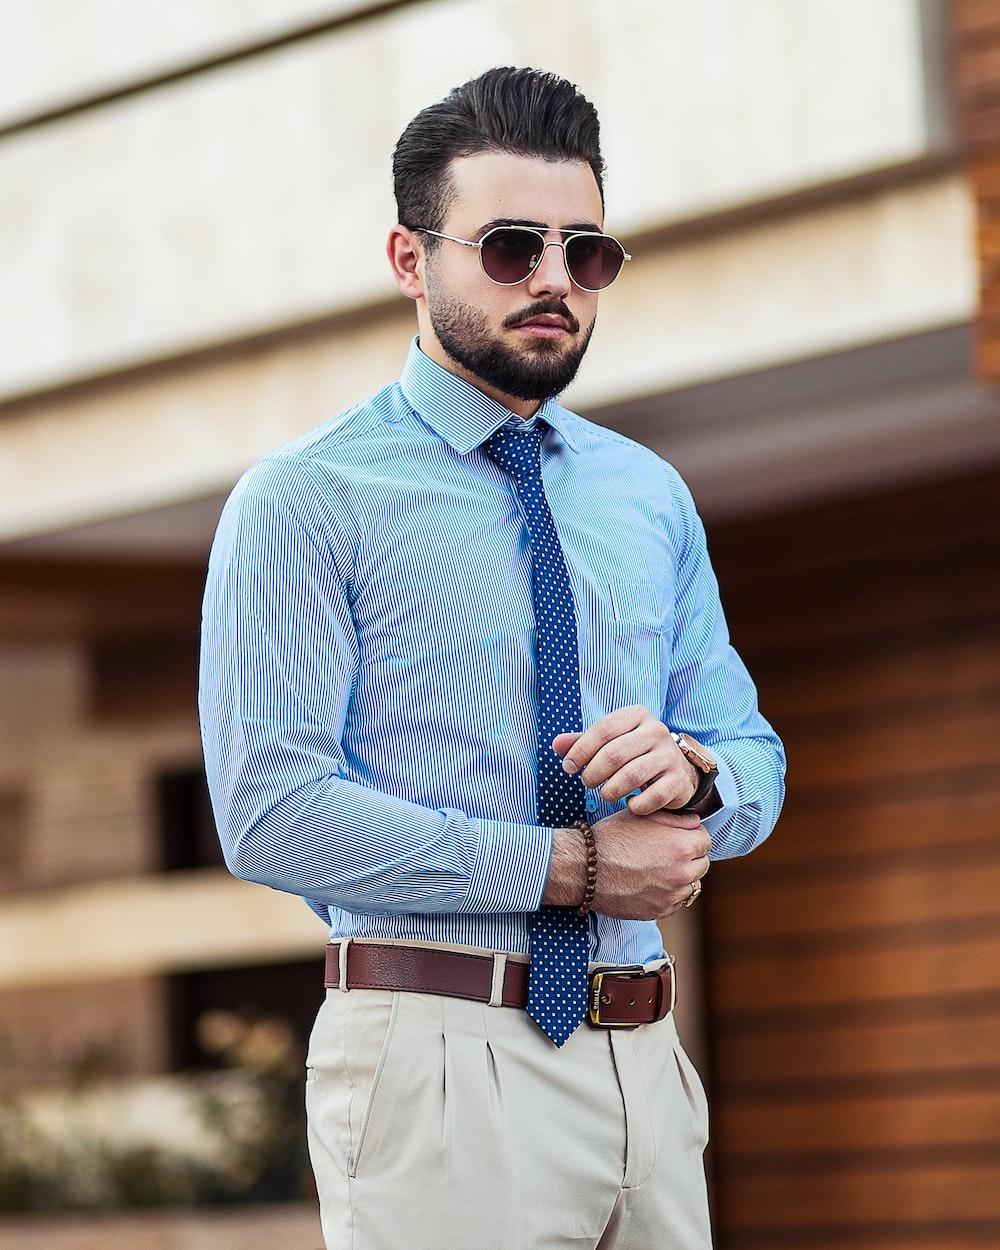 man in blue dress shirt wearing black sunglasses